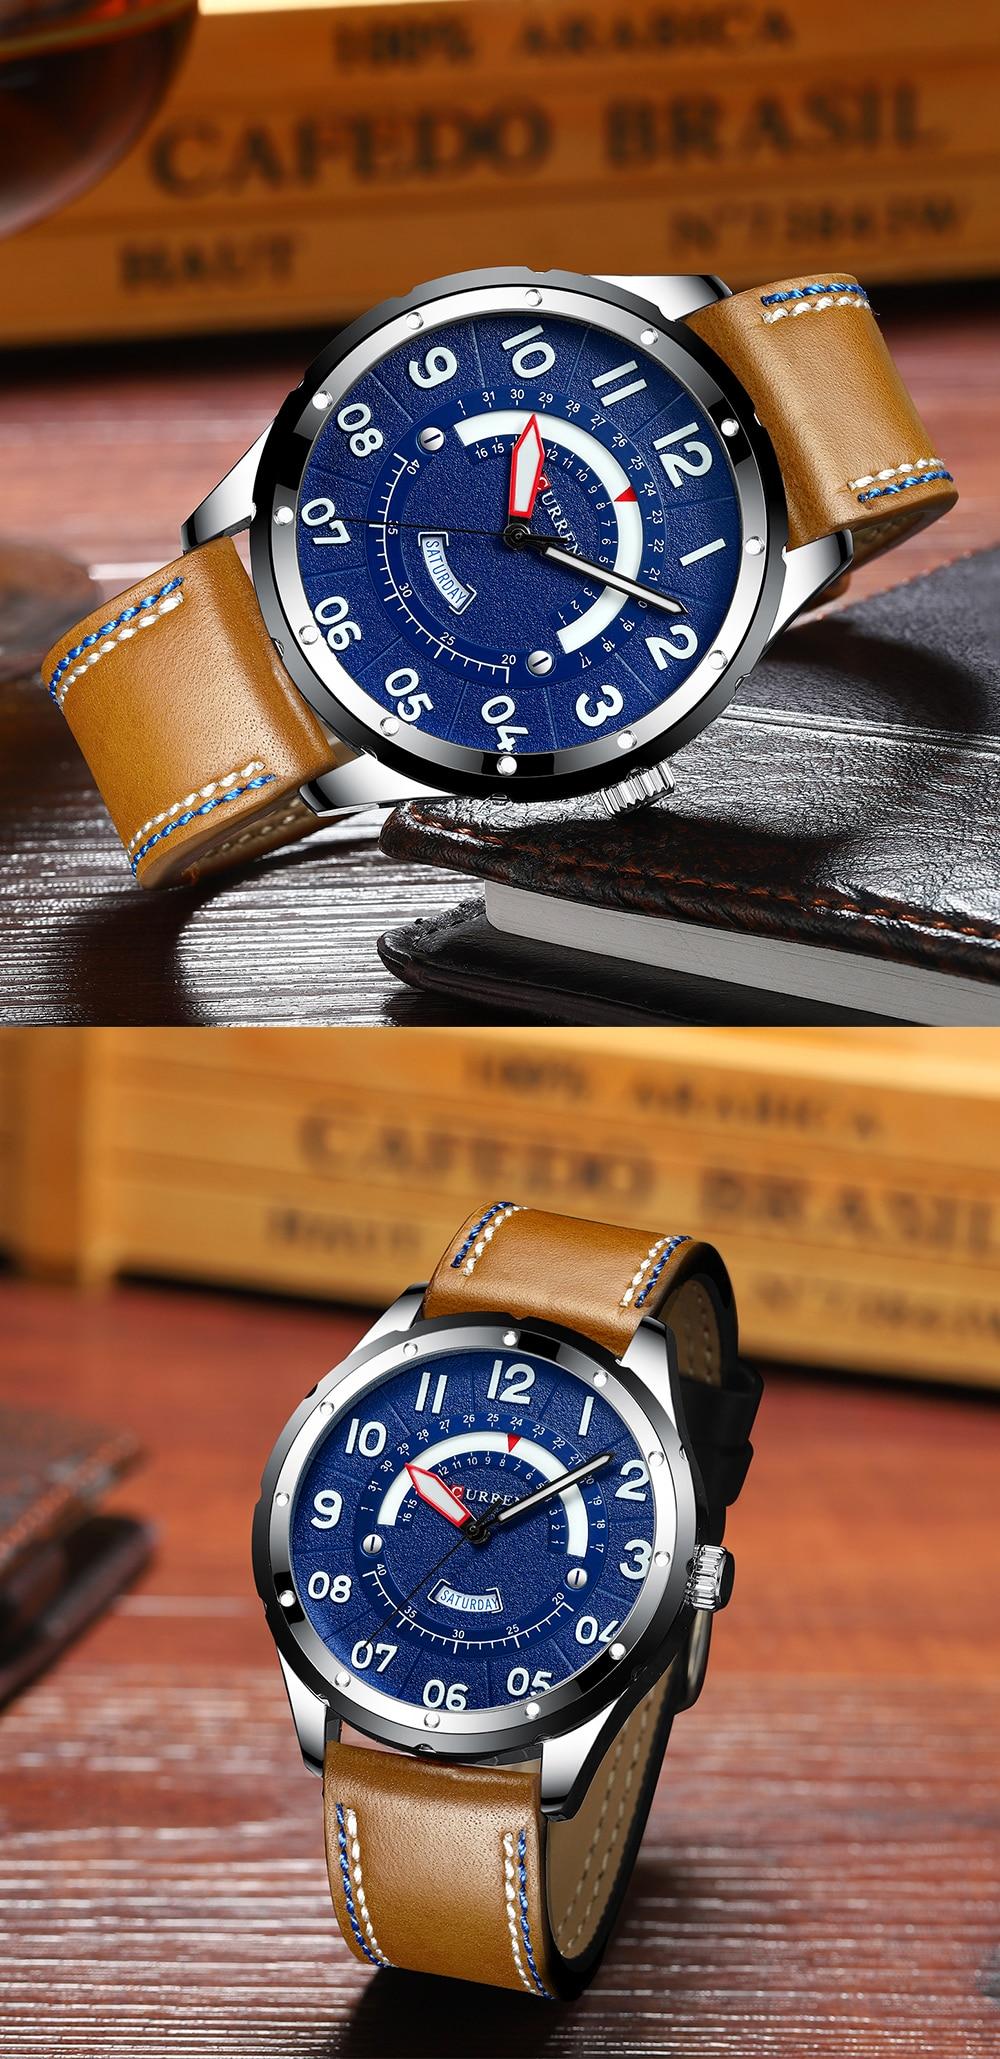 HTB1DRdsarr1gK0jSZFDq6z9yVXav CURREN Date Mens Watches Luxury Sport Watch